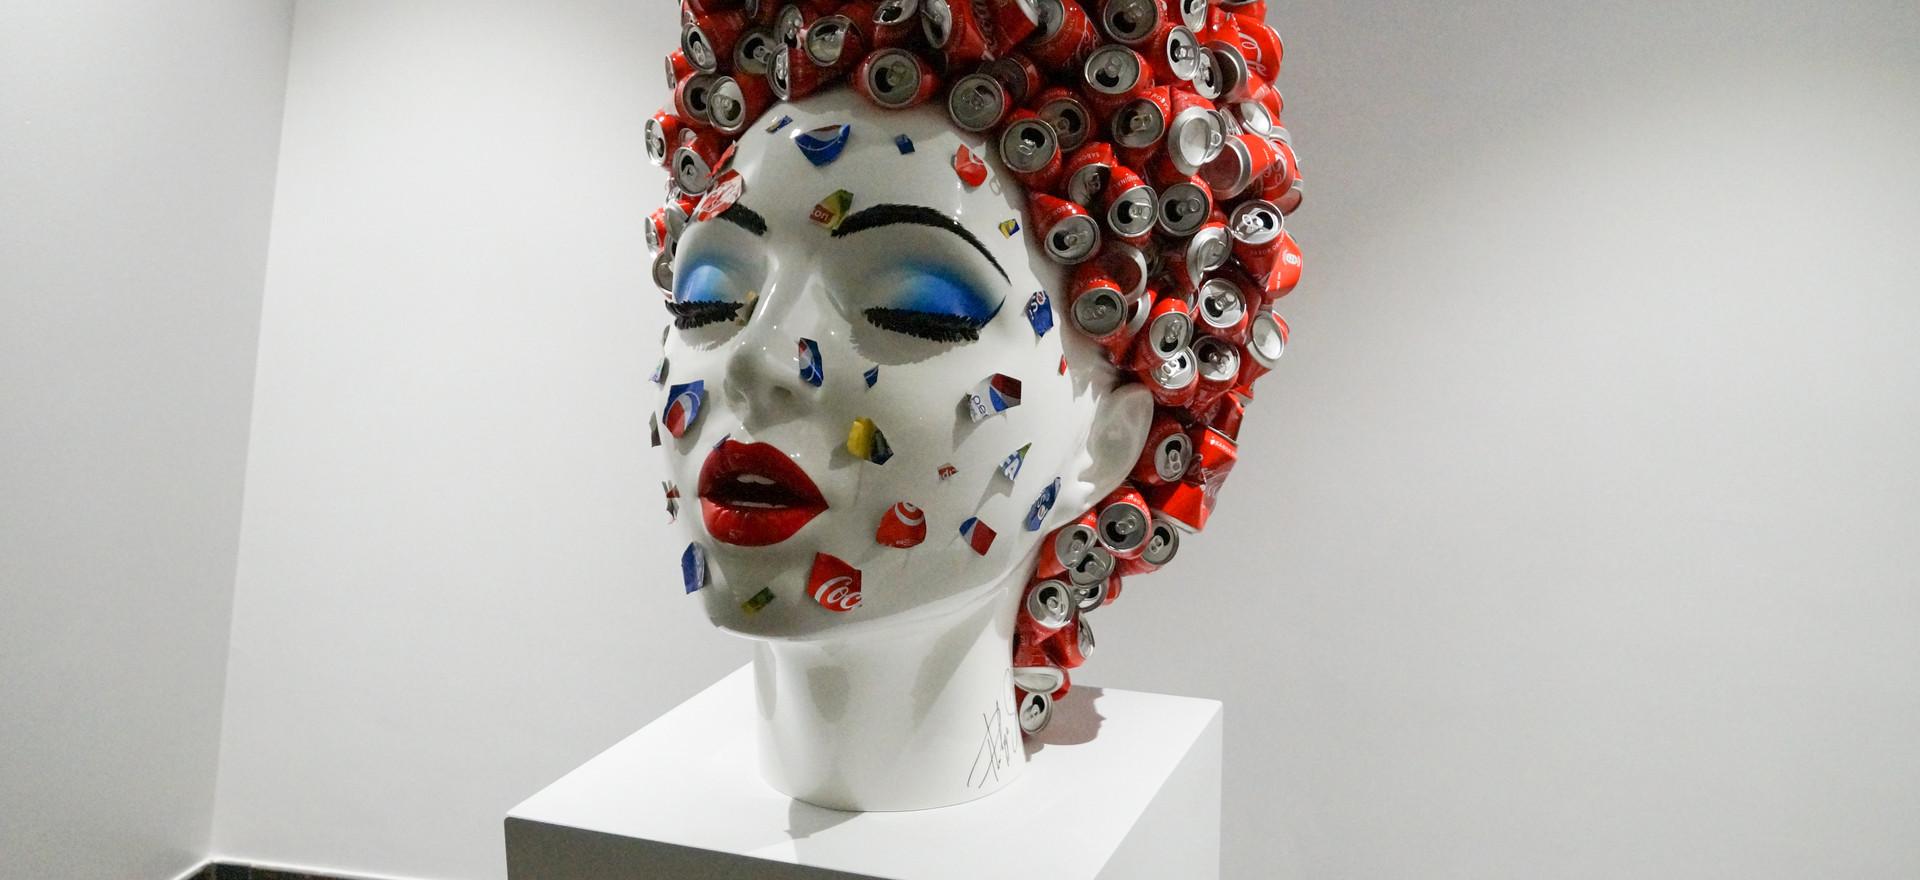 Explosed Can - Sculpture